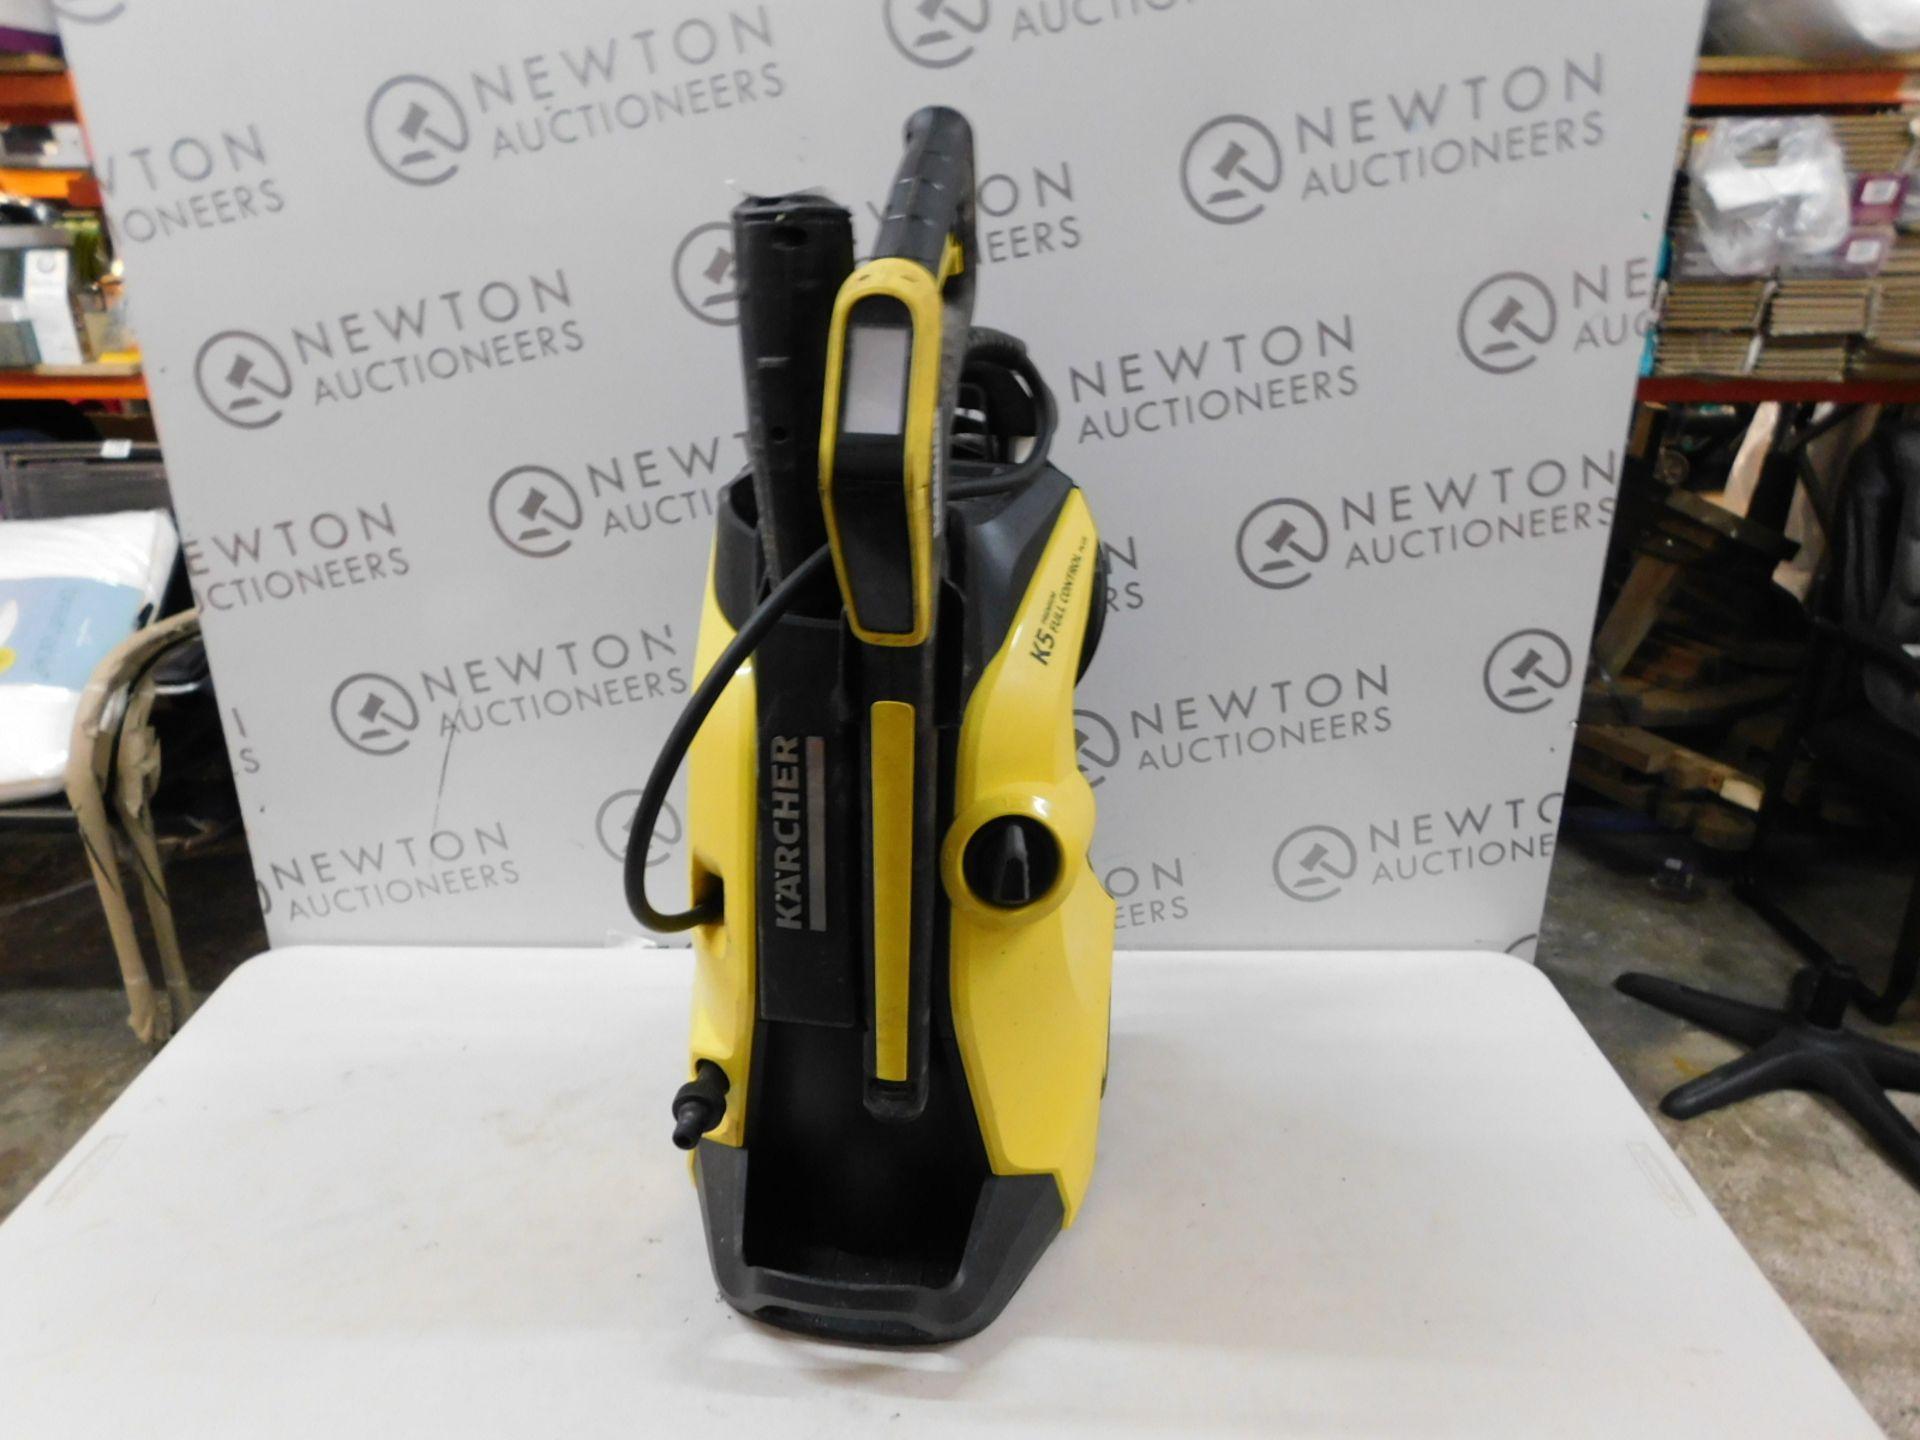 1 KARCHER K5 PREMIUM FULL CONTROL PLUS HIGH PRESSURE WASHER RRP £299